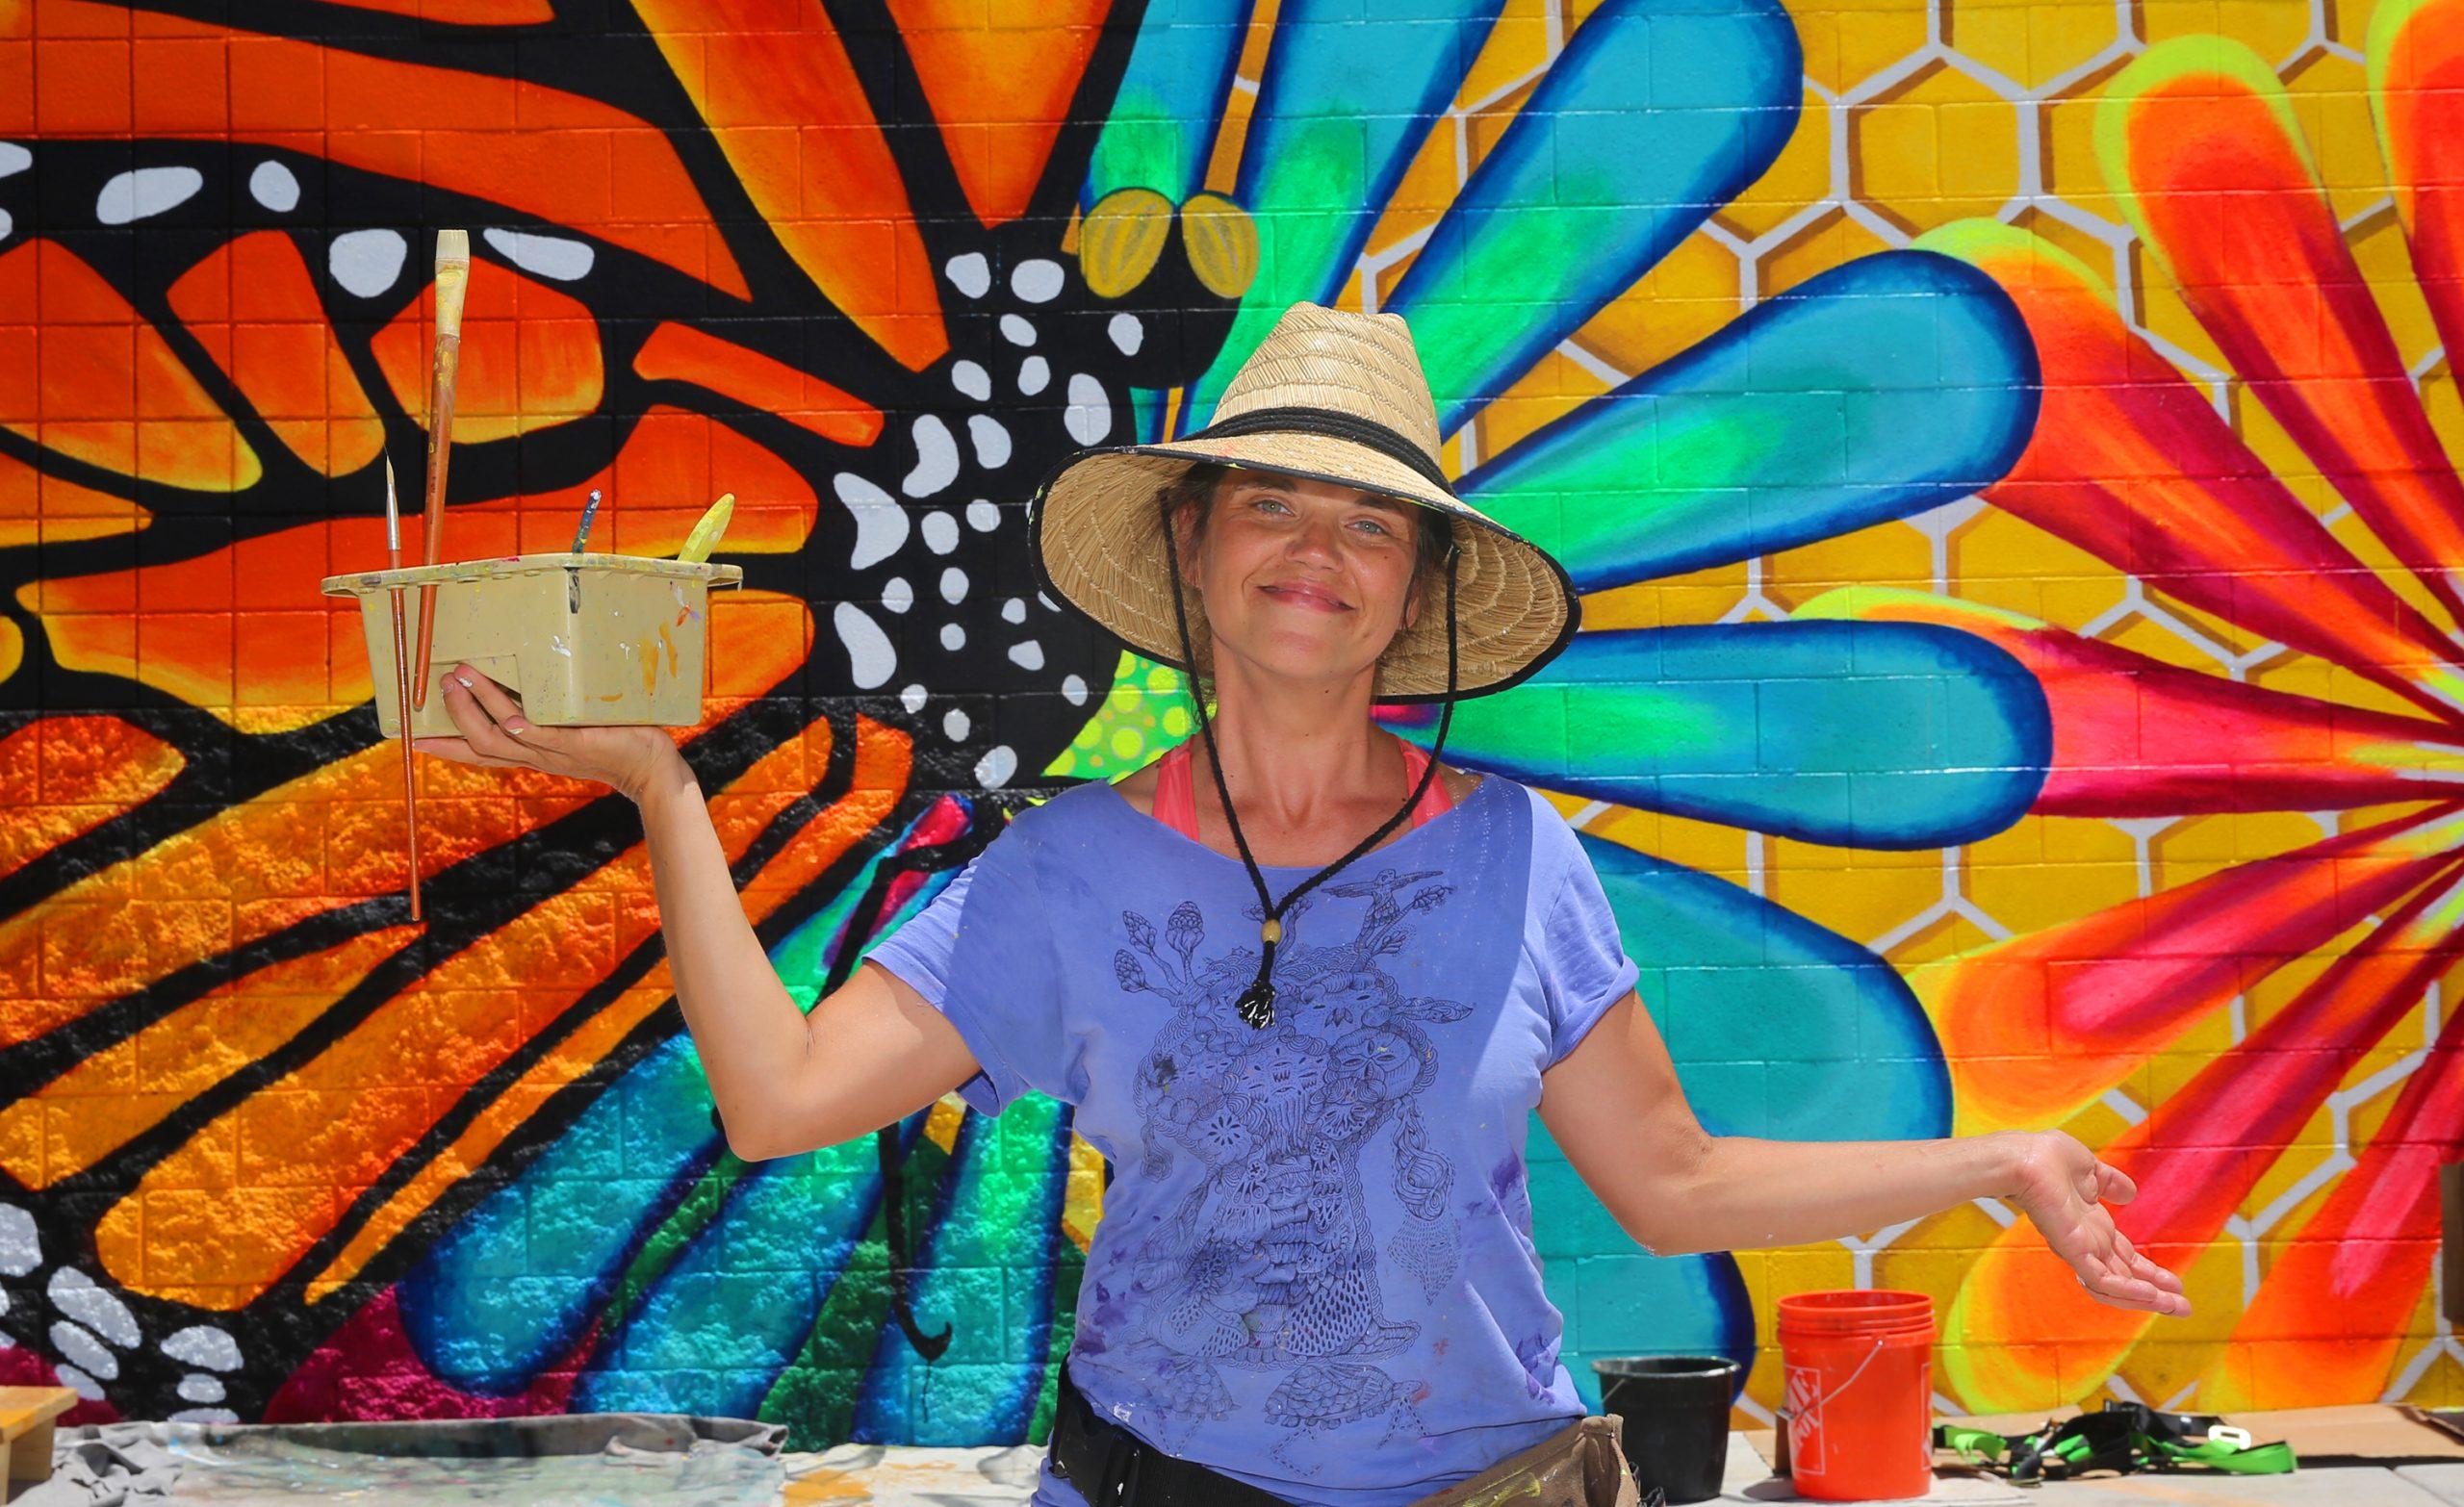 Lake Havasu Mural Artists Share Their Works And Inspirations